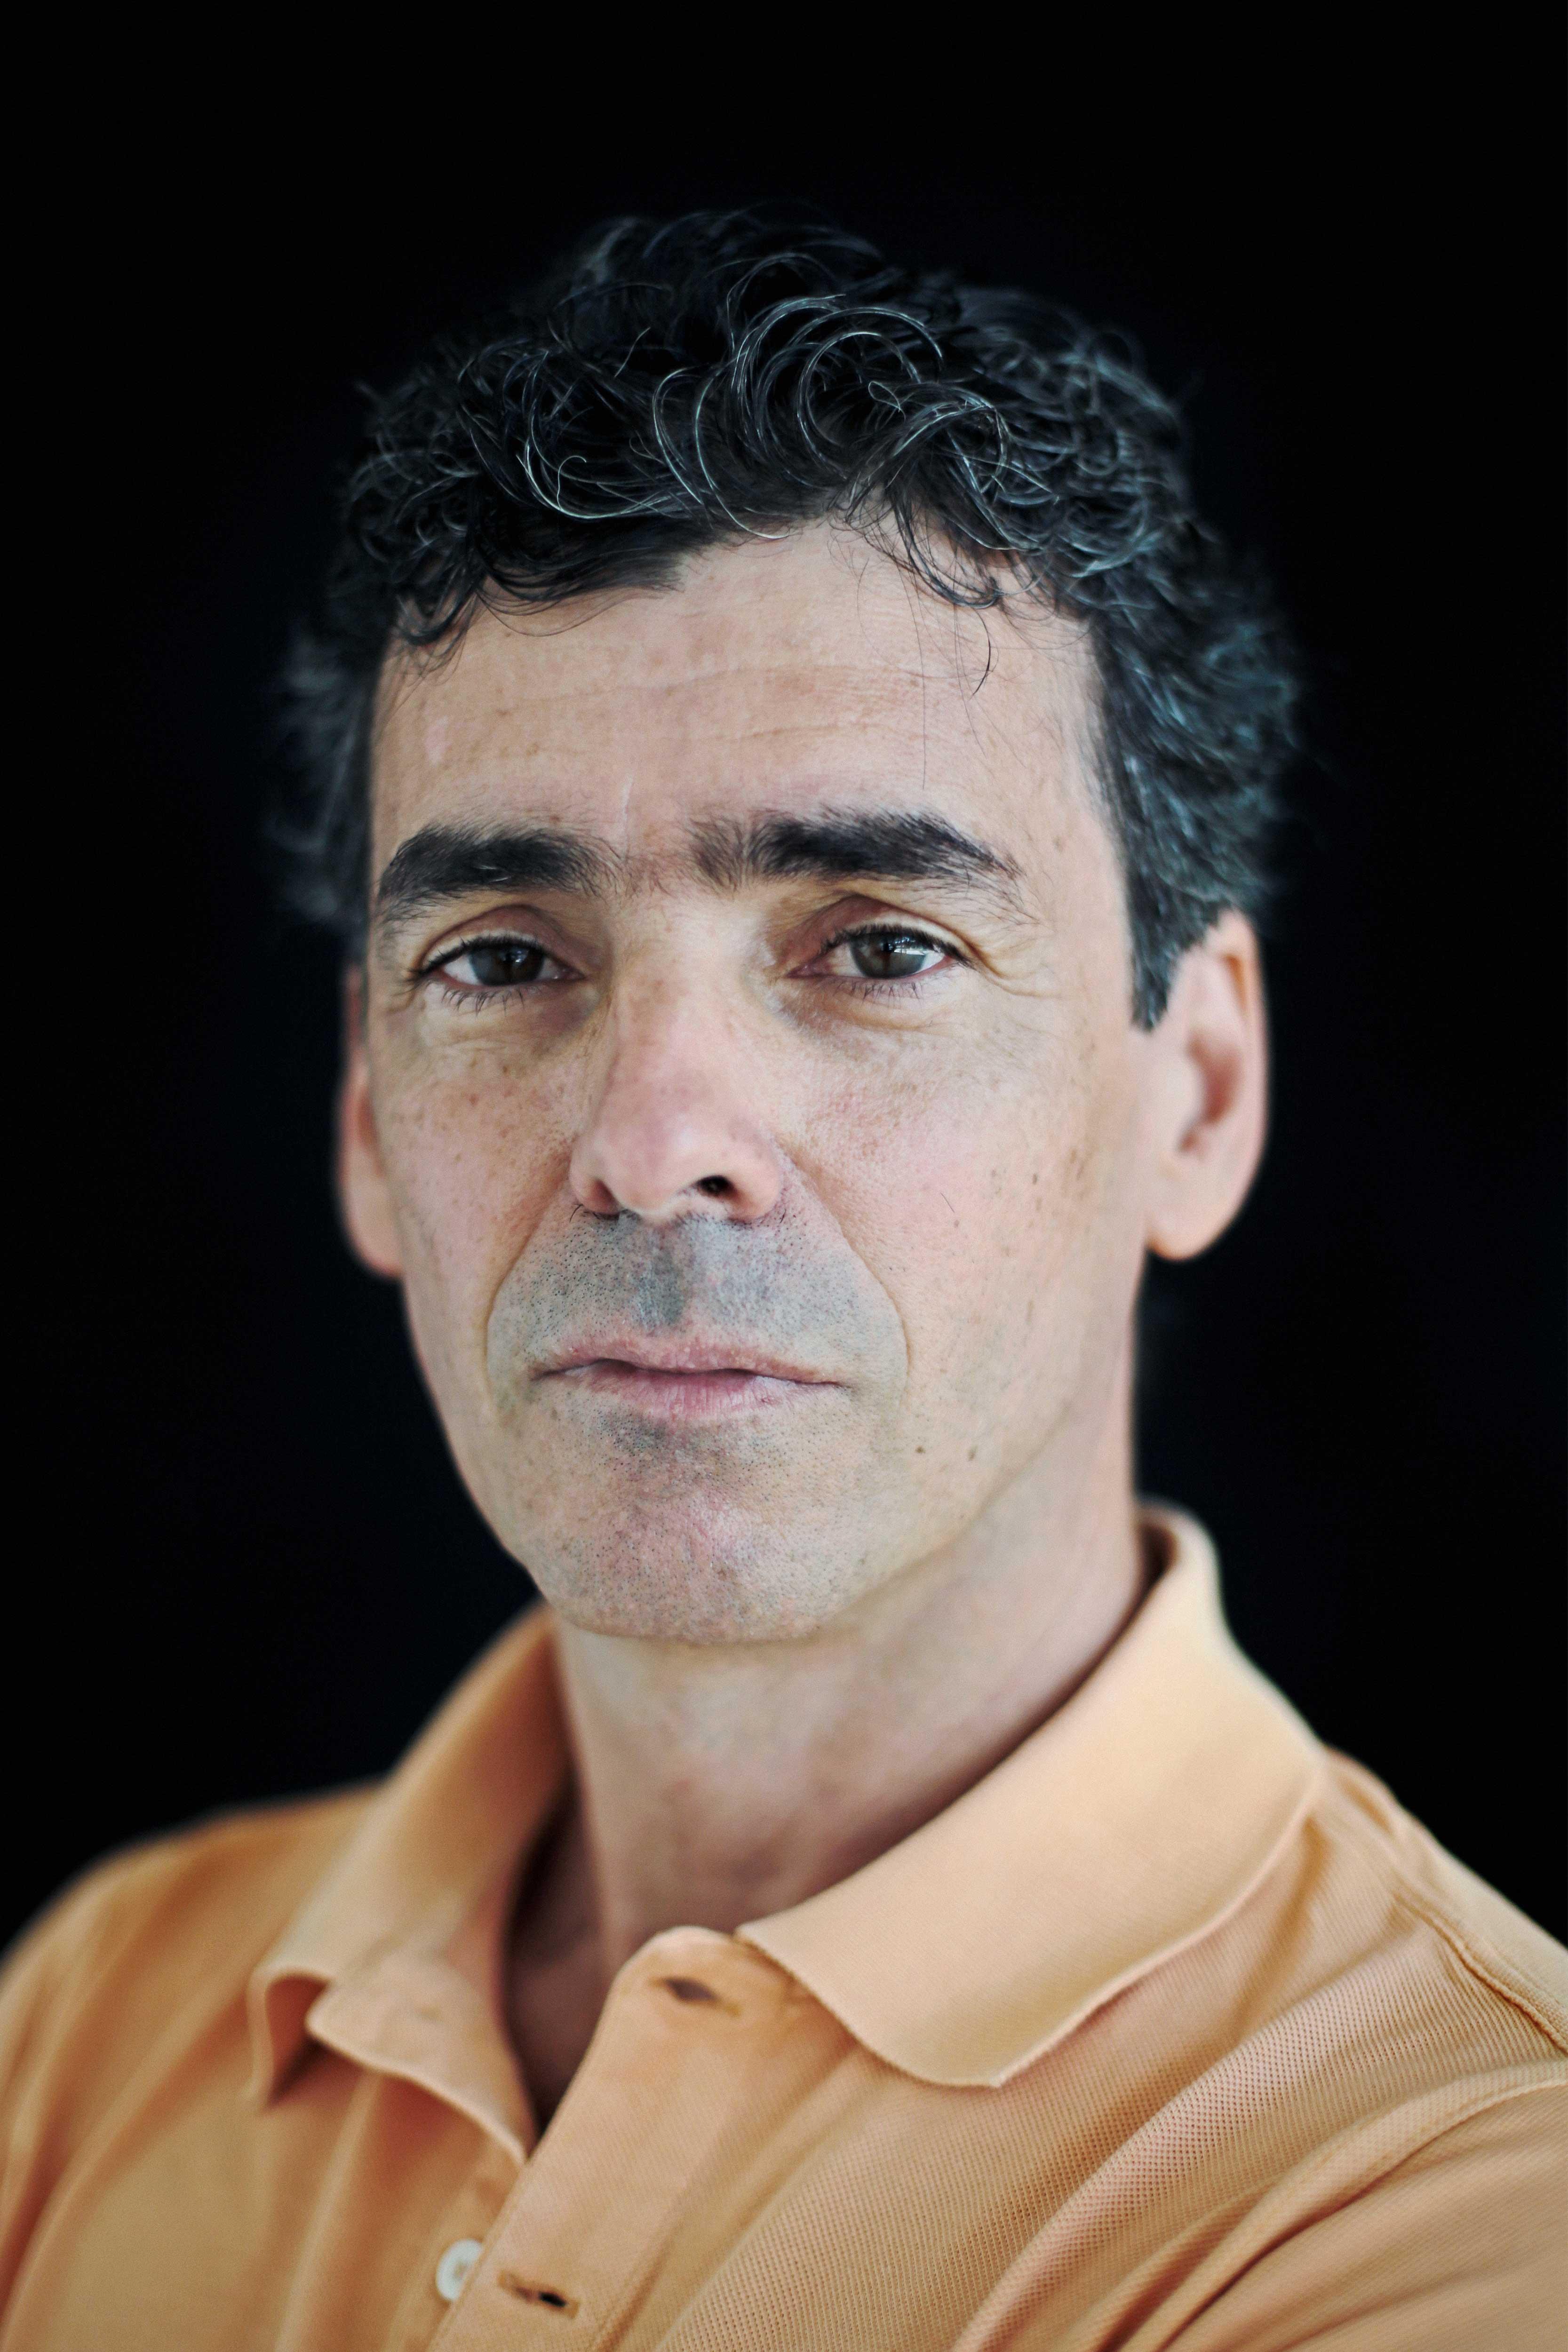 João Carlos Petrucci